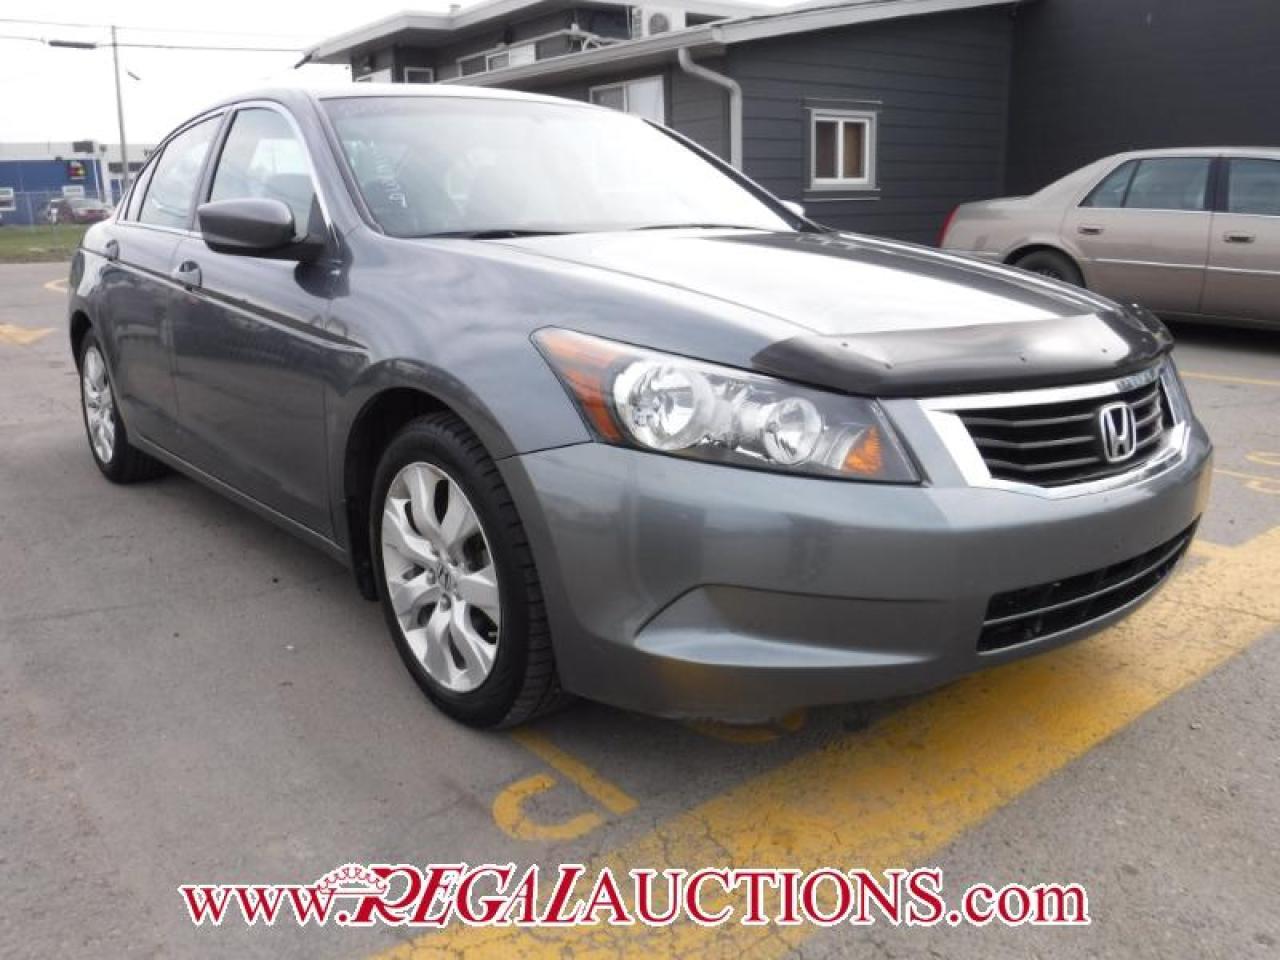 Photo of Grey 2010 Honda Accord